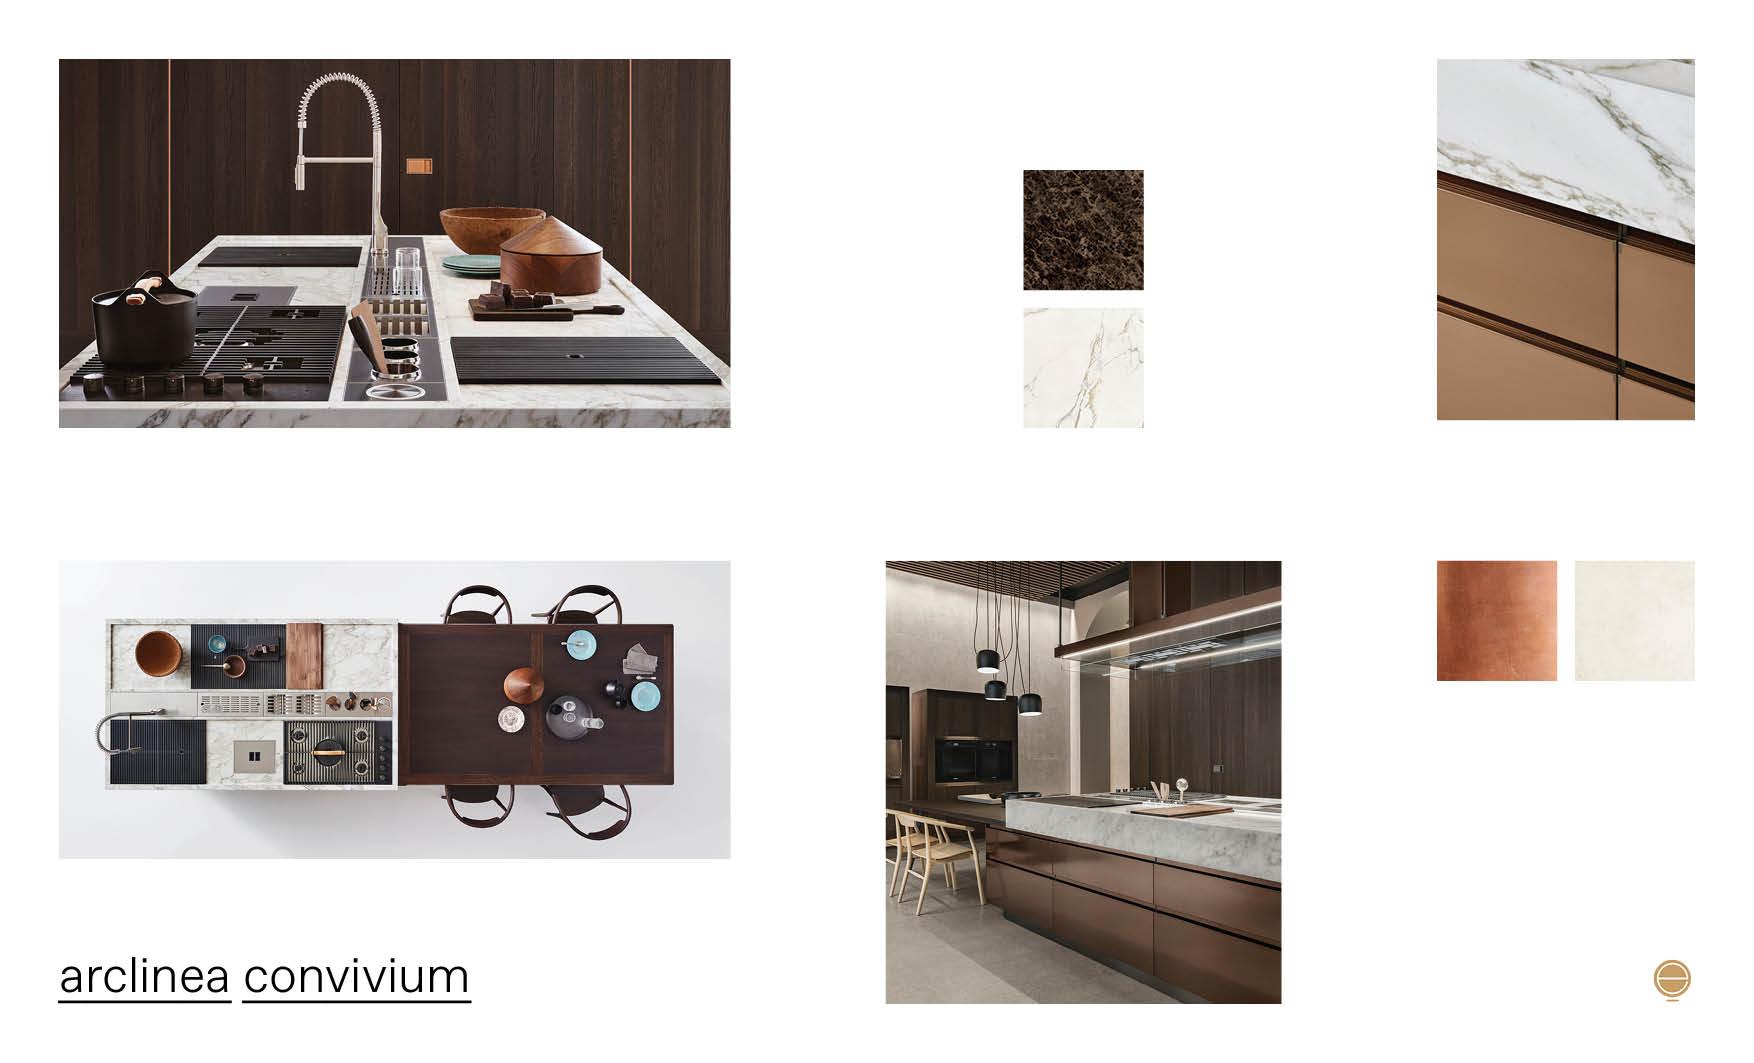 contemporary Italian kitchen design and arclinea convivium product